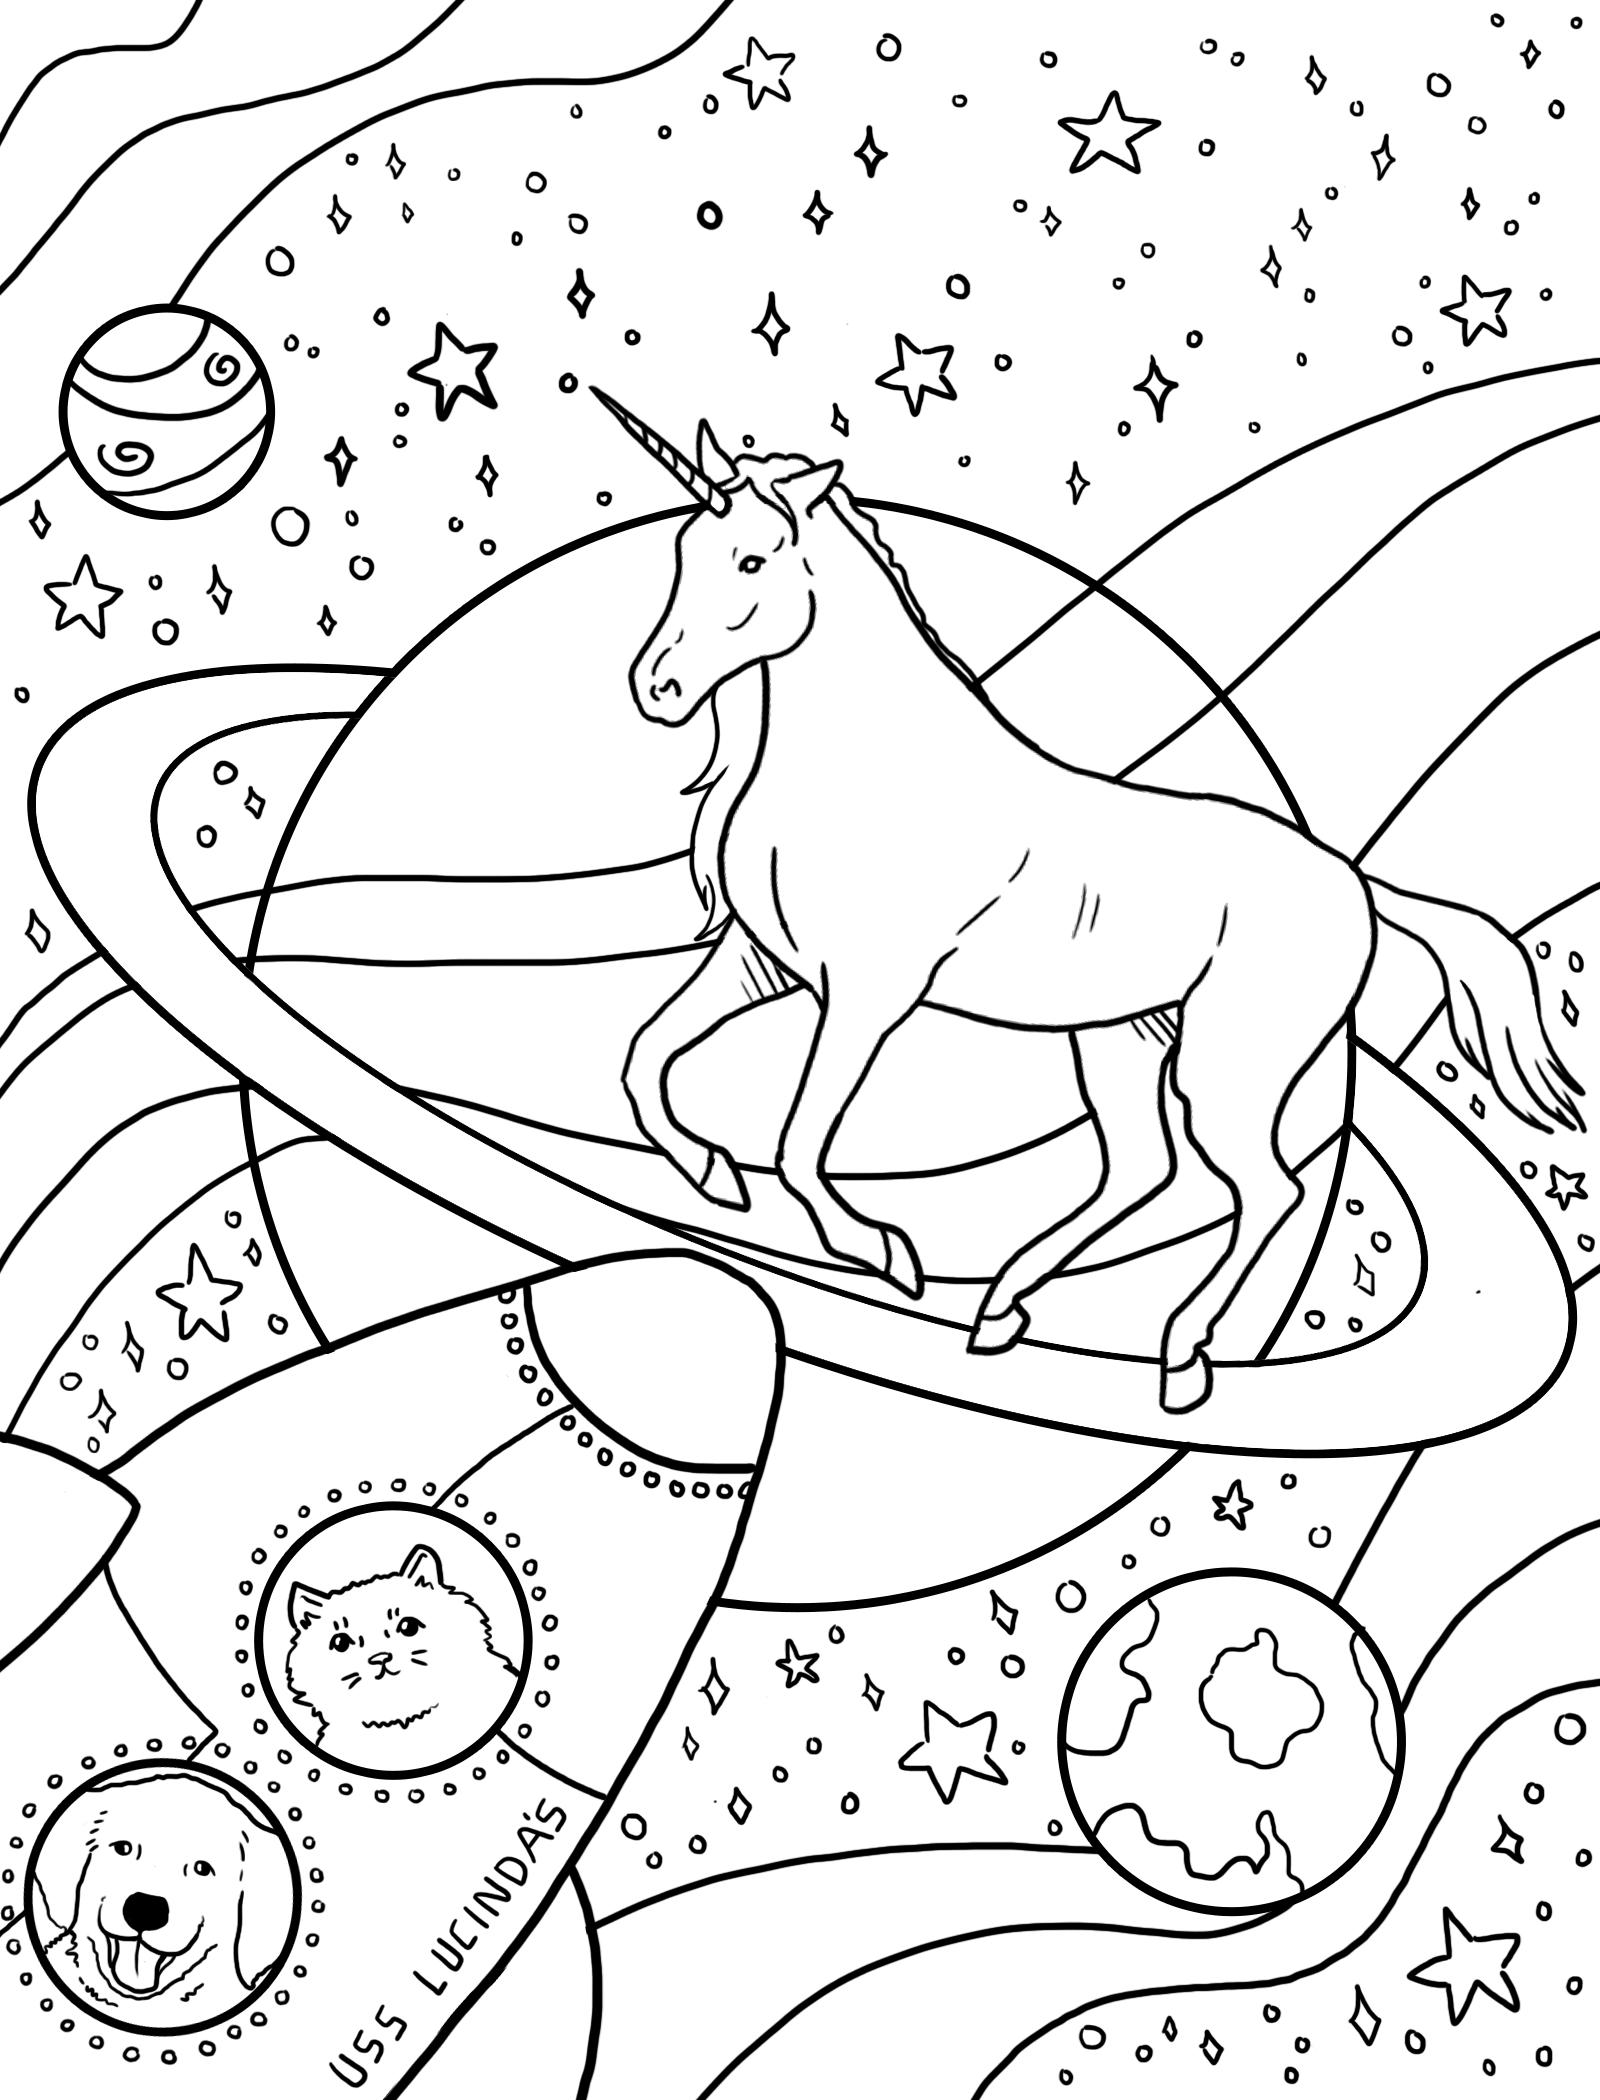 coloringpage01